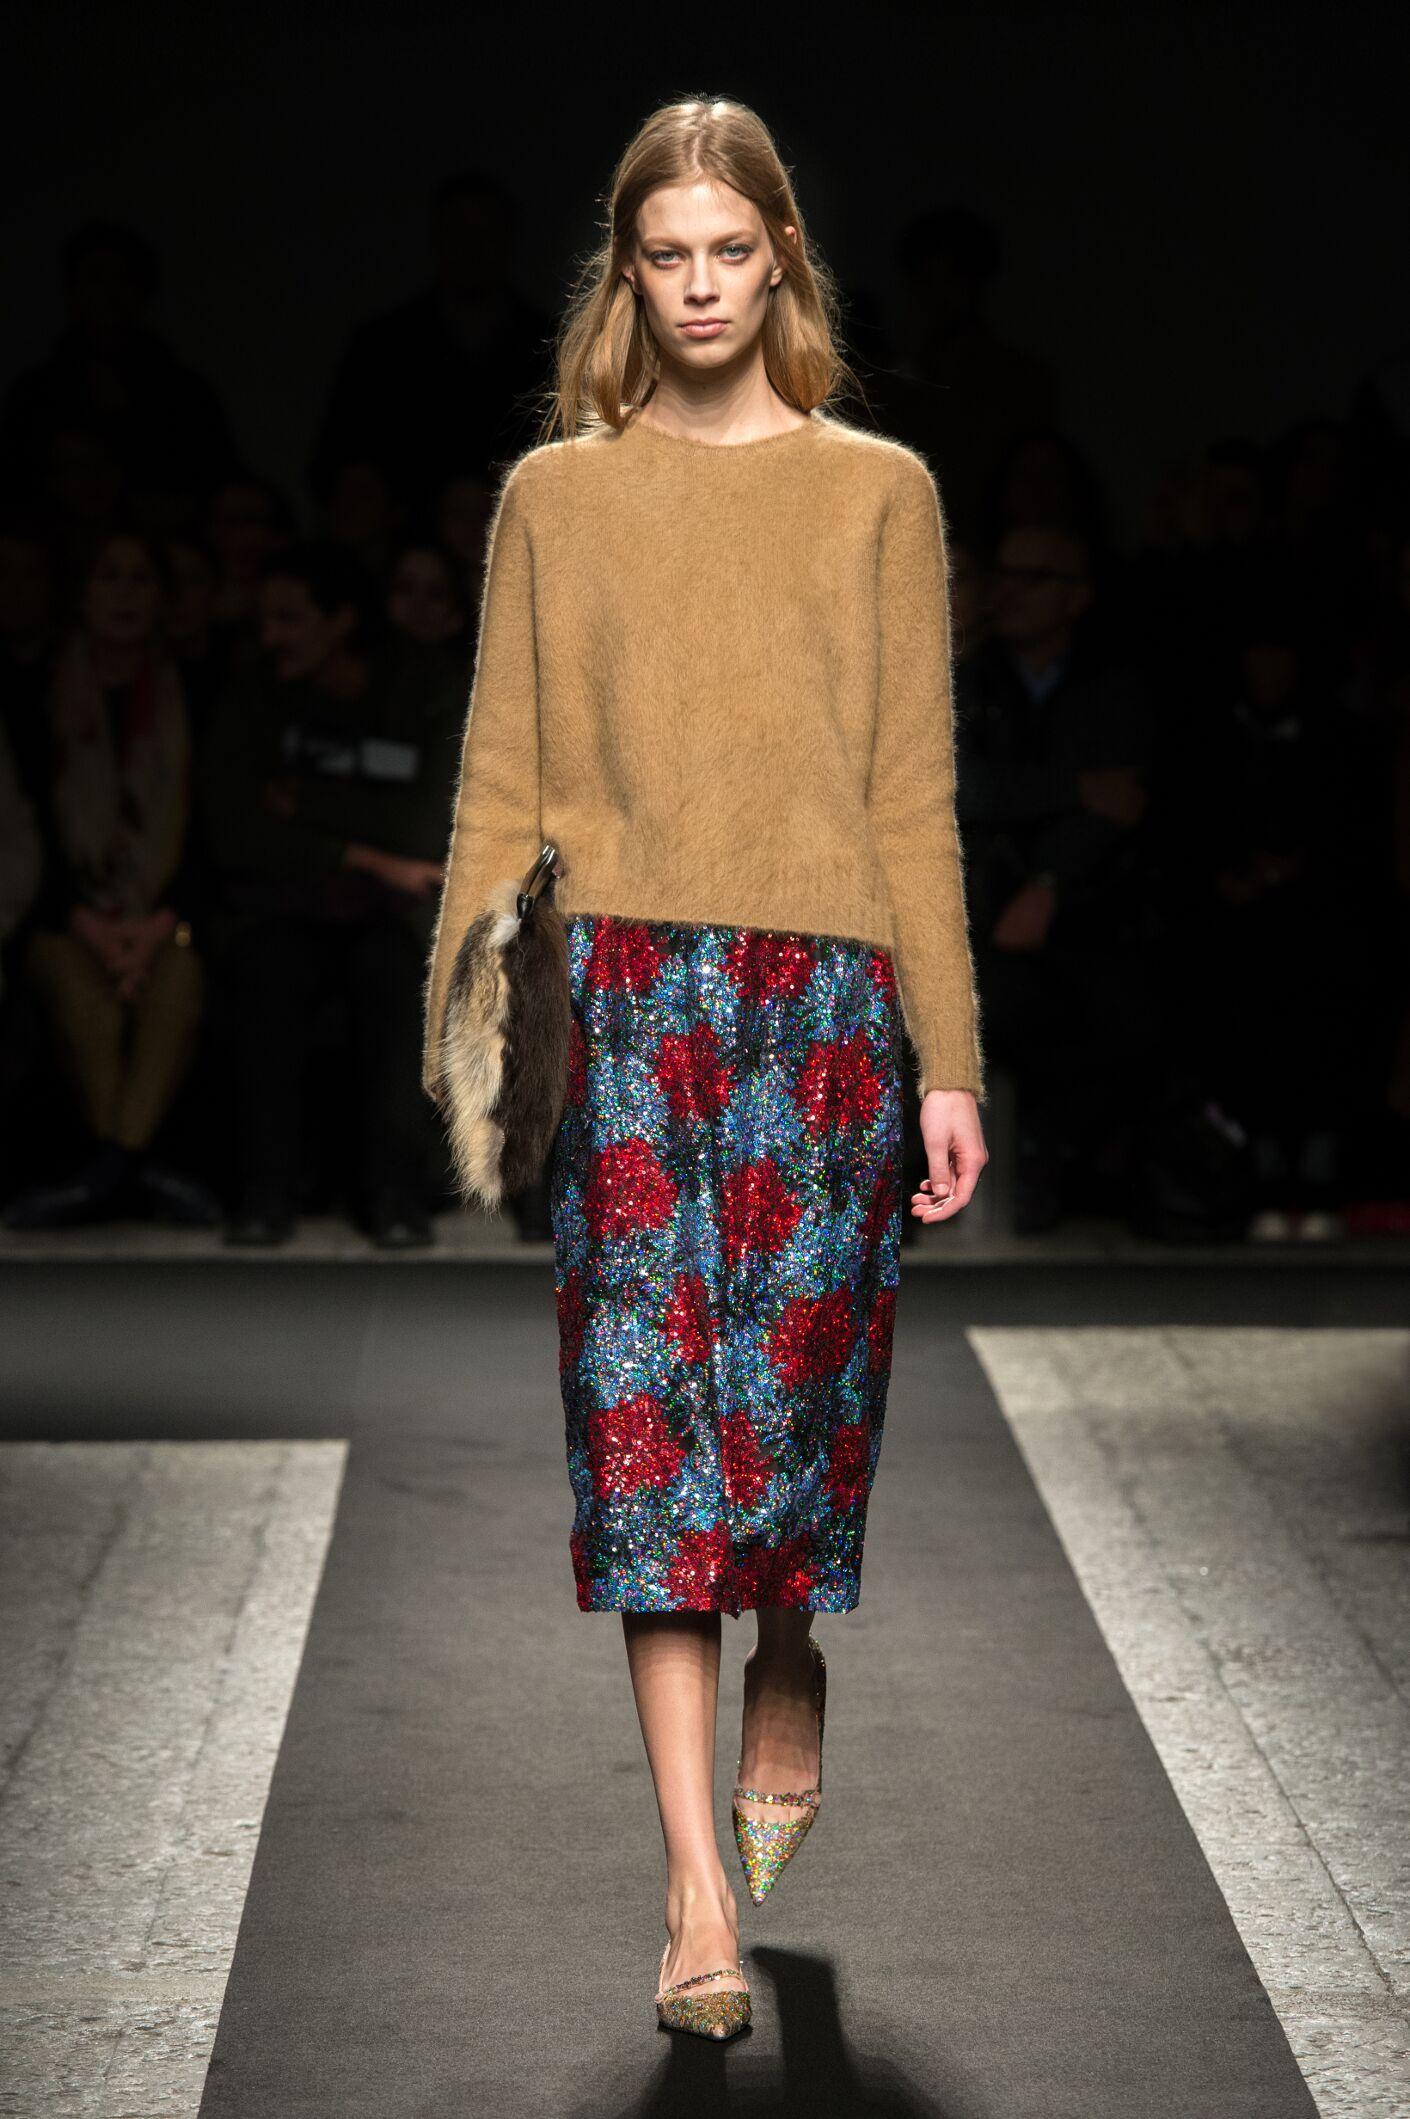 2014 2015 Winter Fashion Trends N21